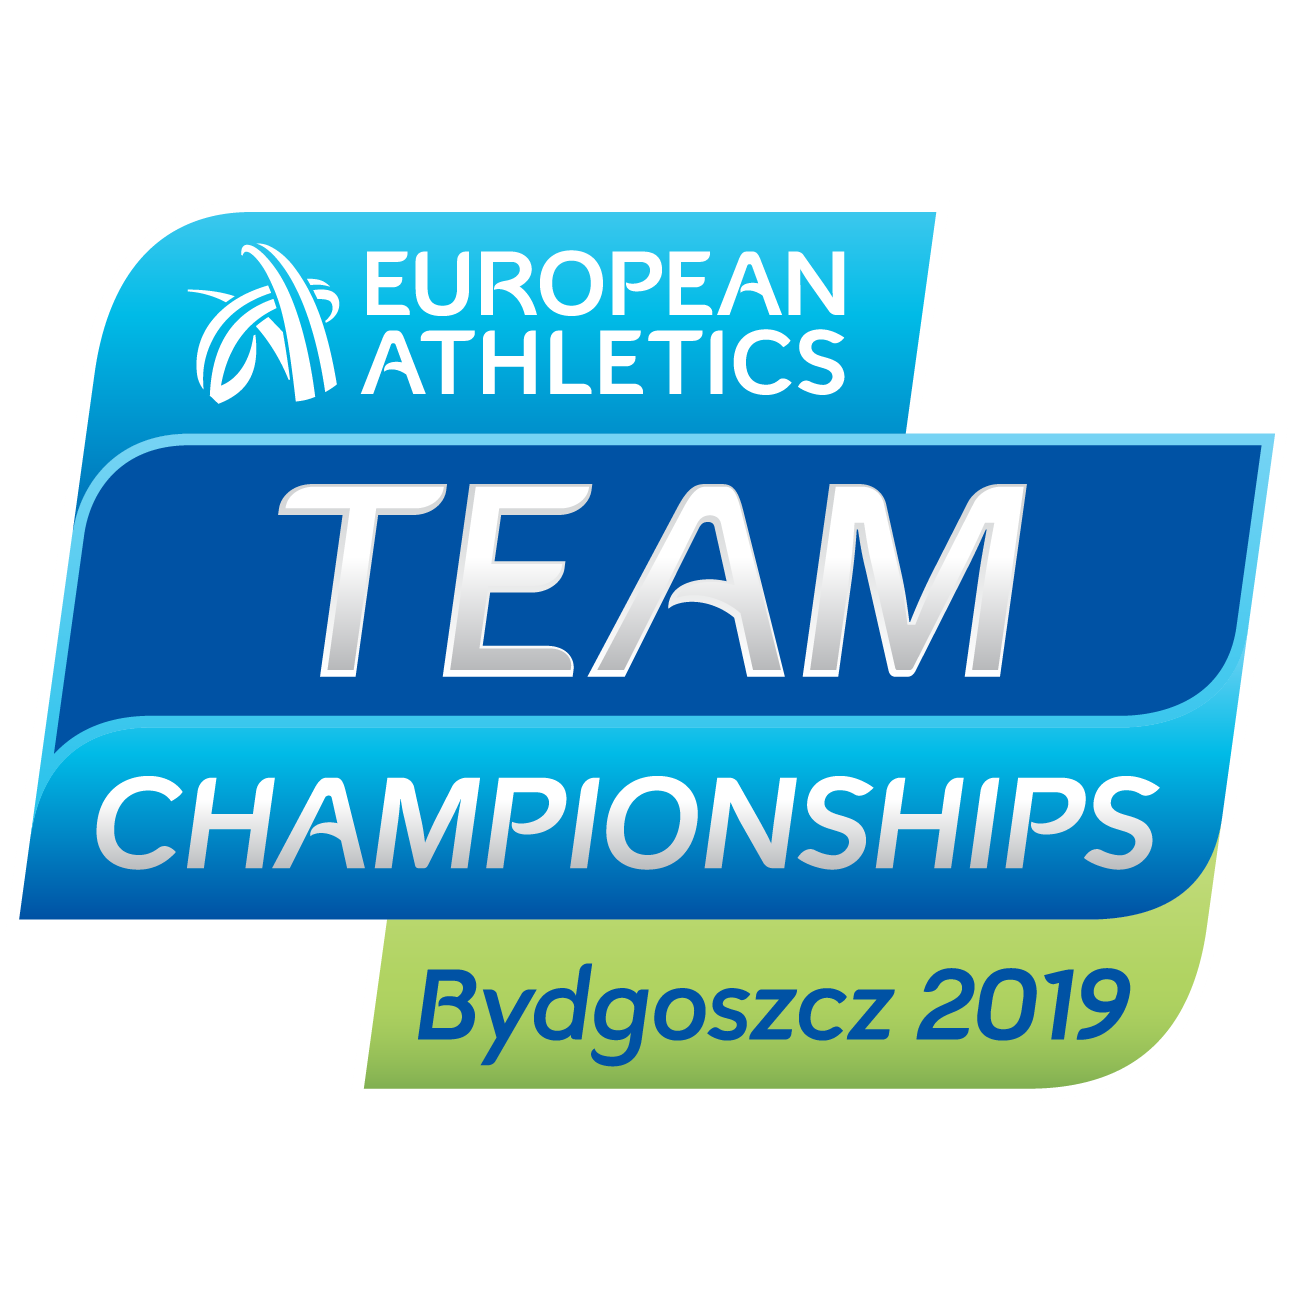 2019 European Athletics Team Championships